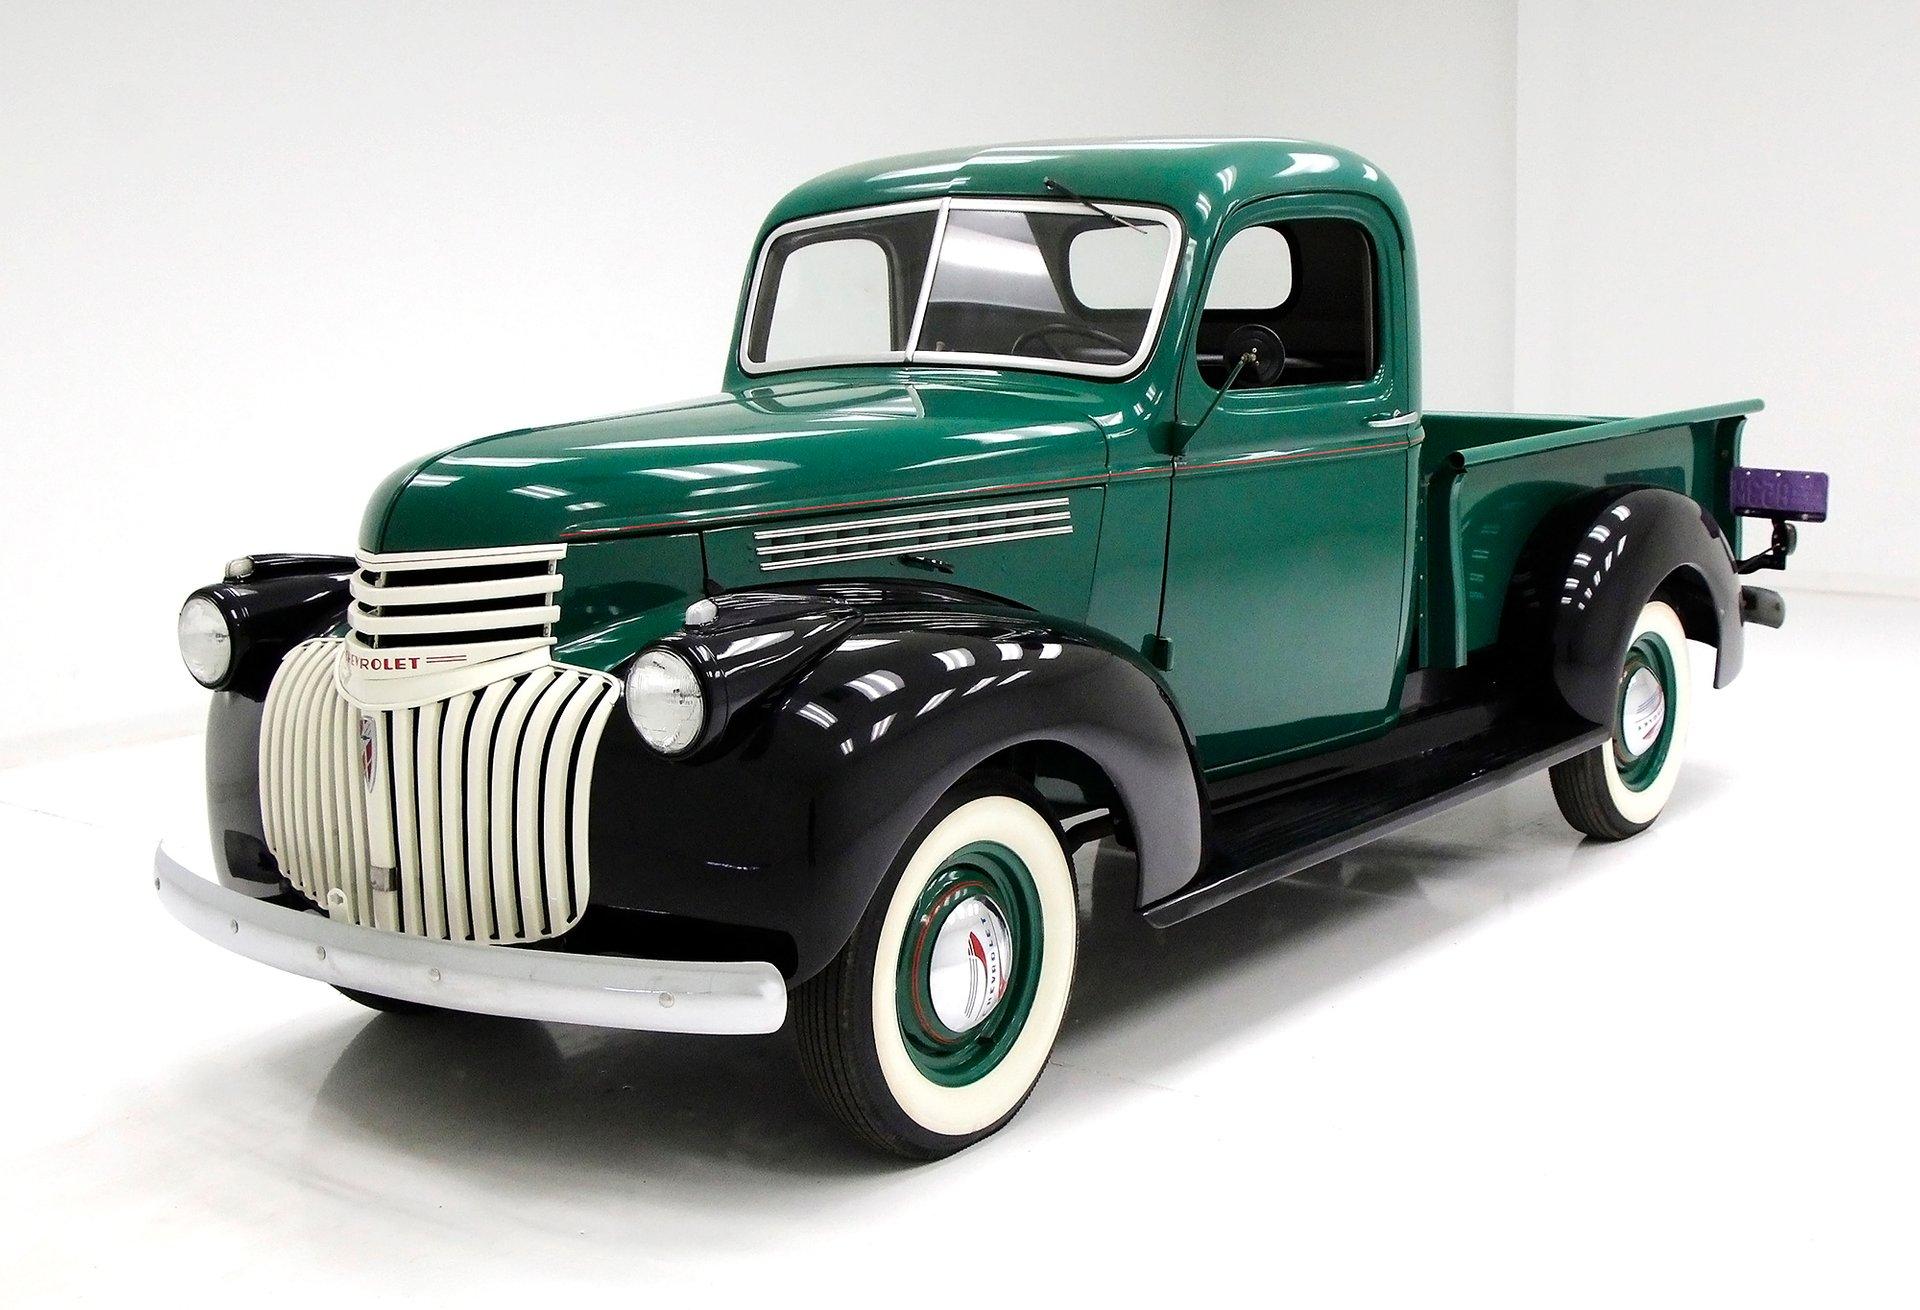 1942 Chevrolet 1/2-Ton Pickup